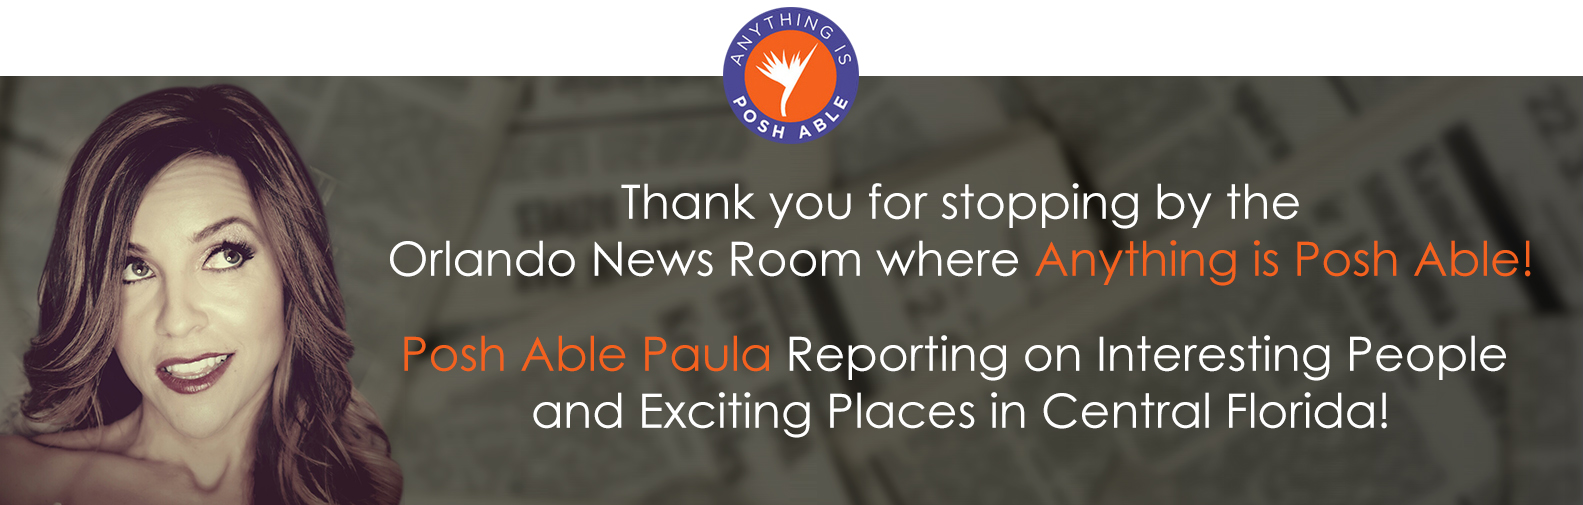 Orlando News Room